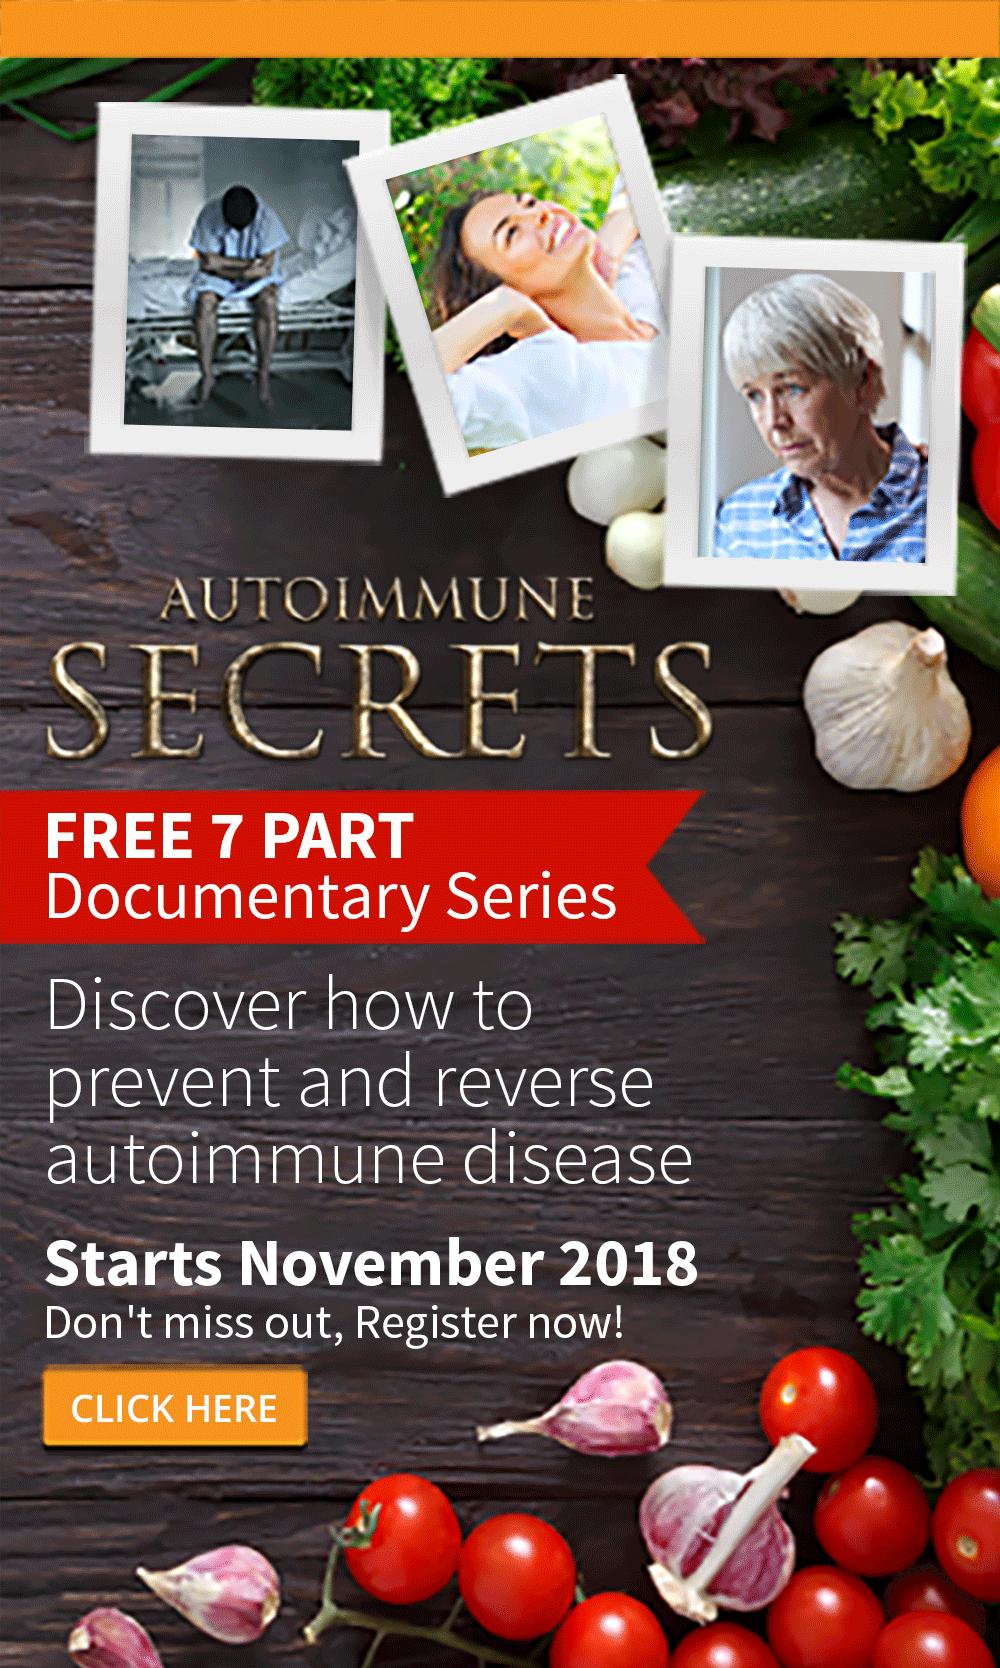 Autoimmune-Secrets-Banner_1-05b